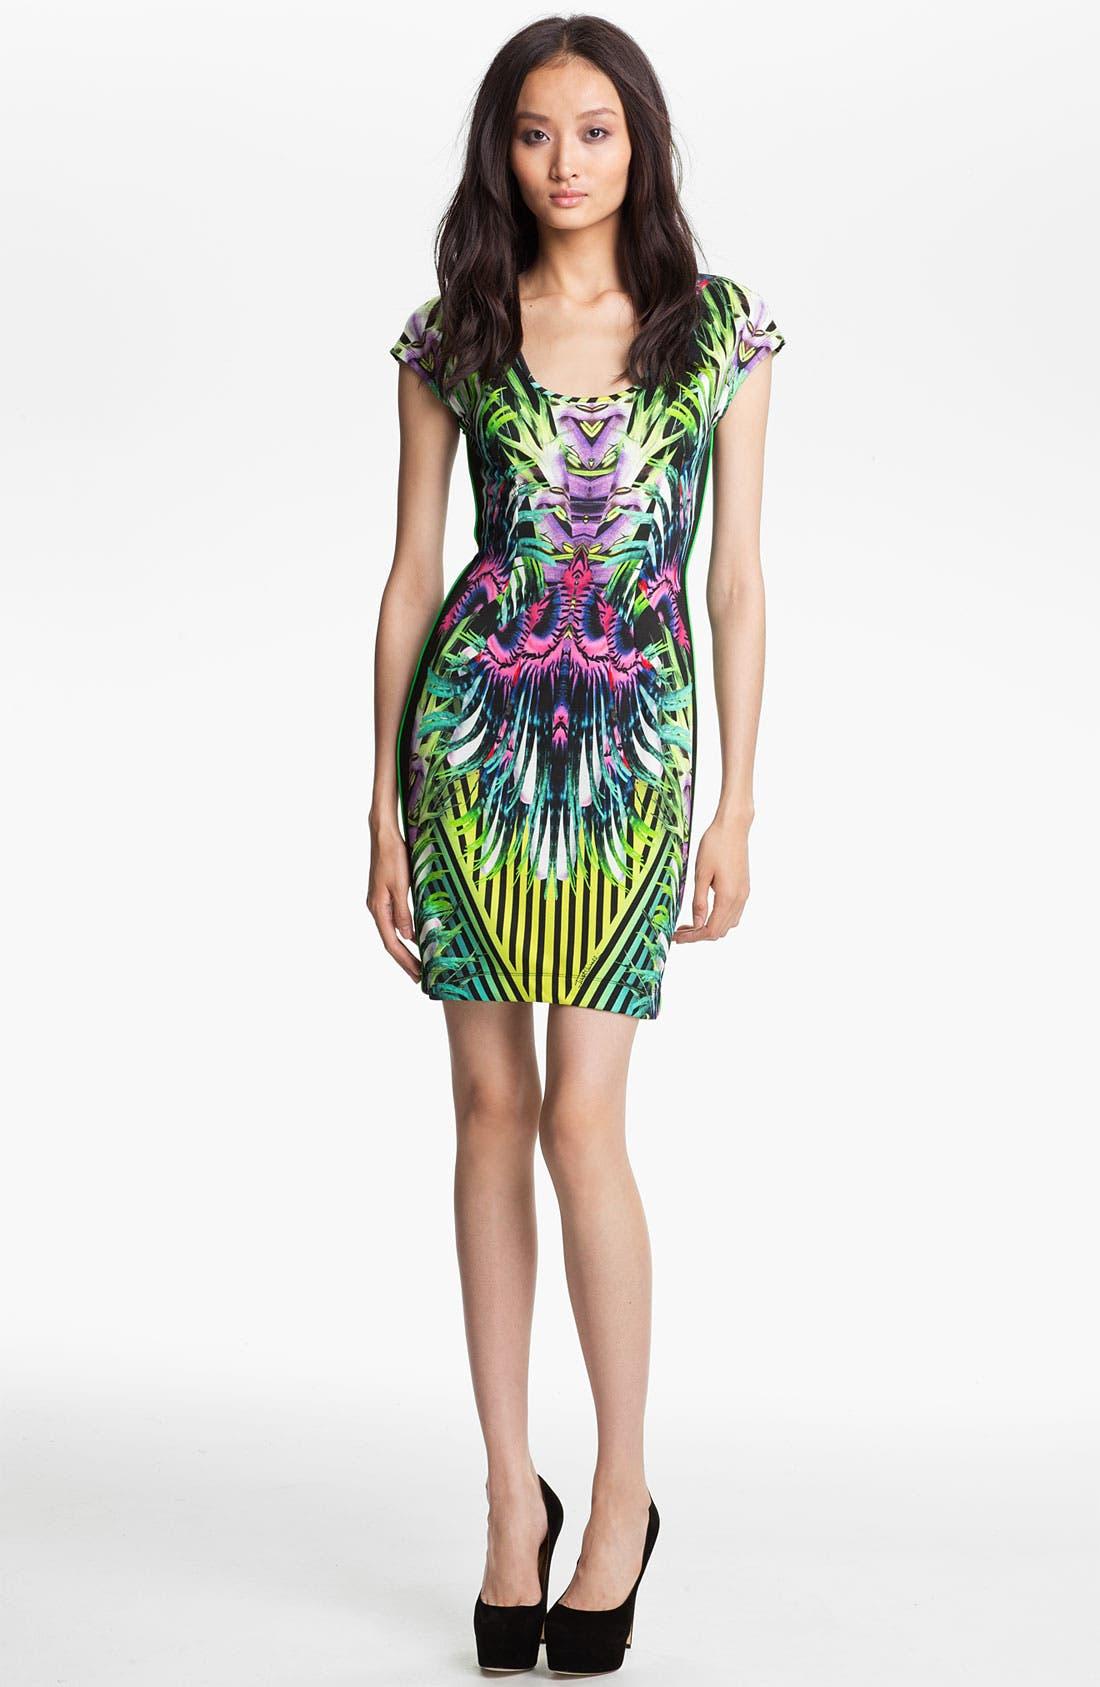 Alternate Image 1 Selected - Just Cavalli 'Jungle' Jersey Dress